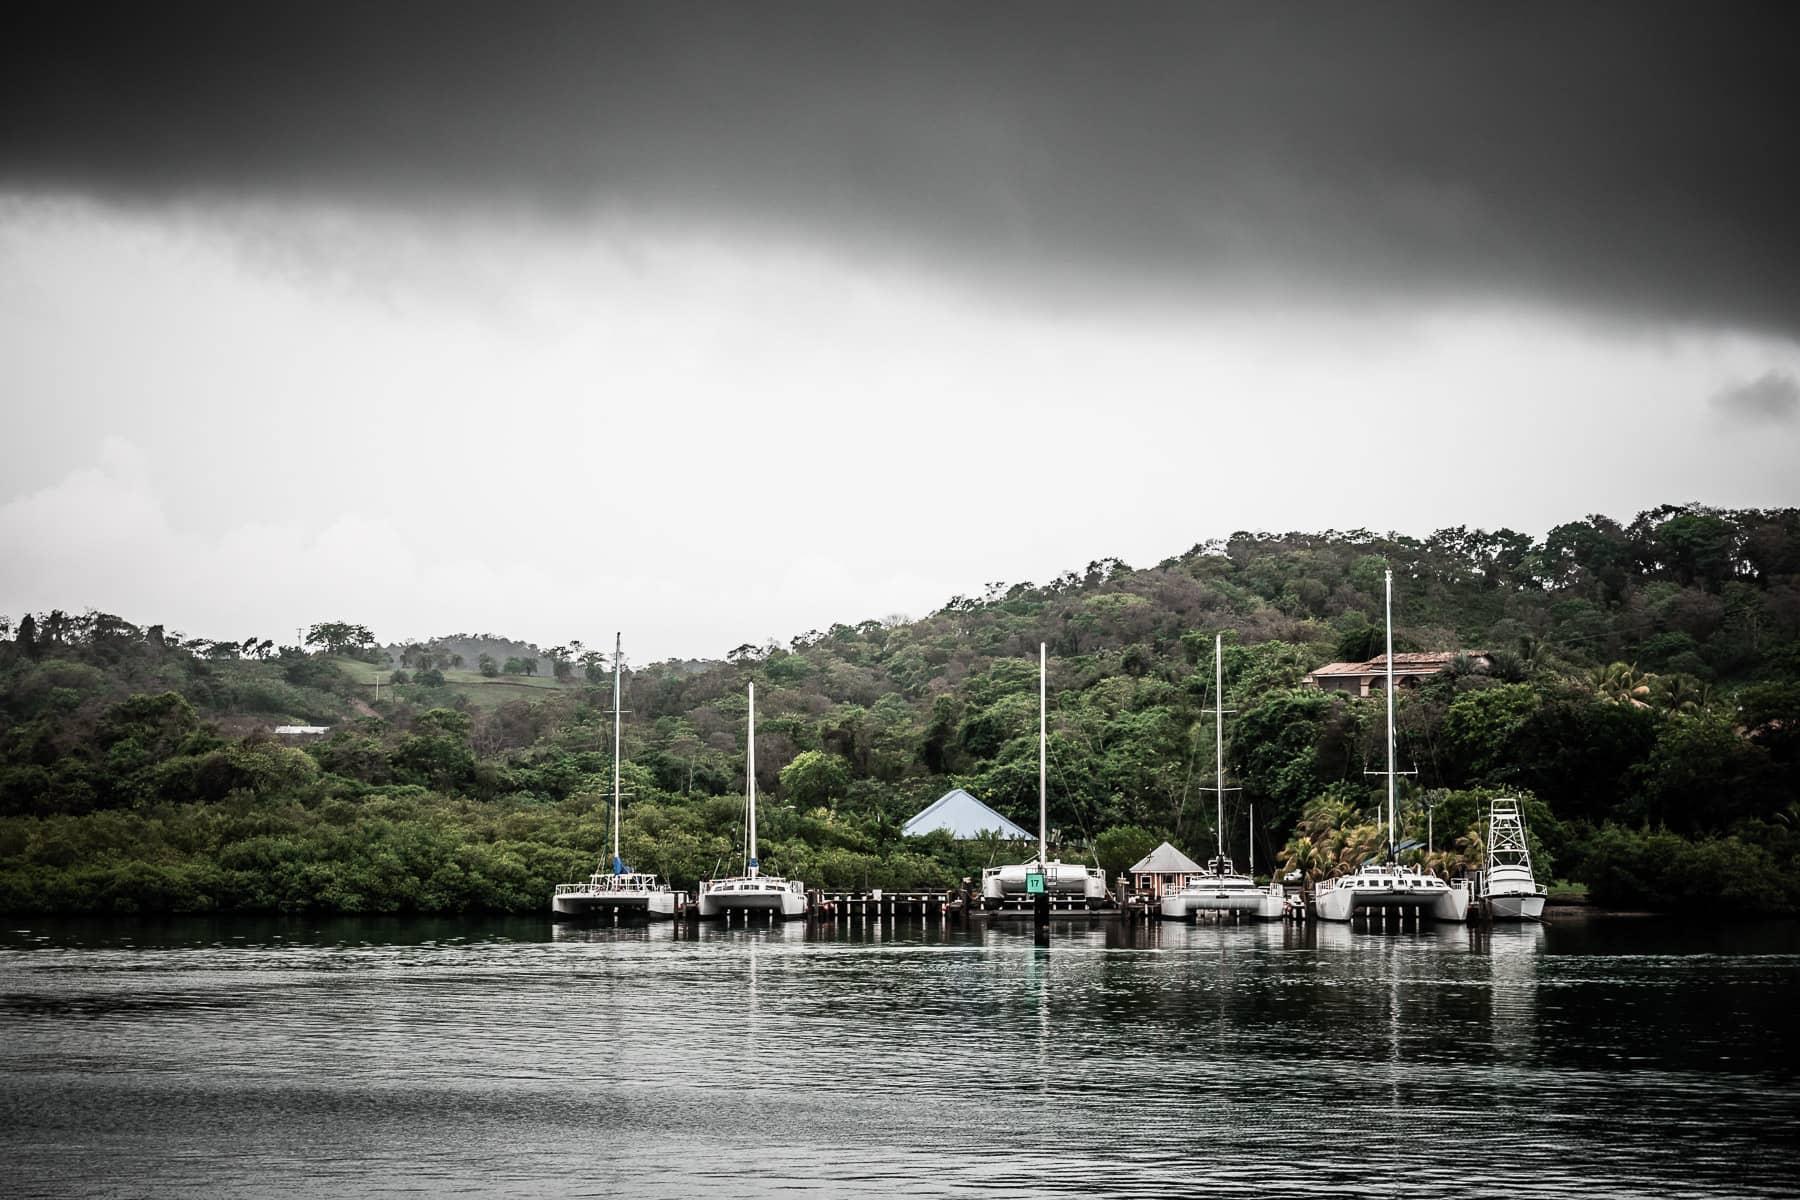 Sailboats docked at pier on the island of Roatán, Honduras, on a rainy, overcast day.